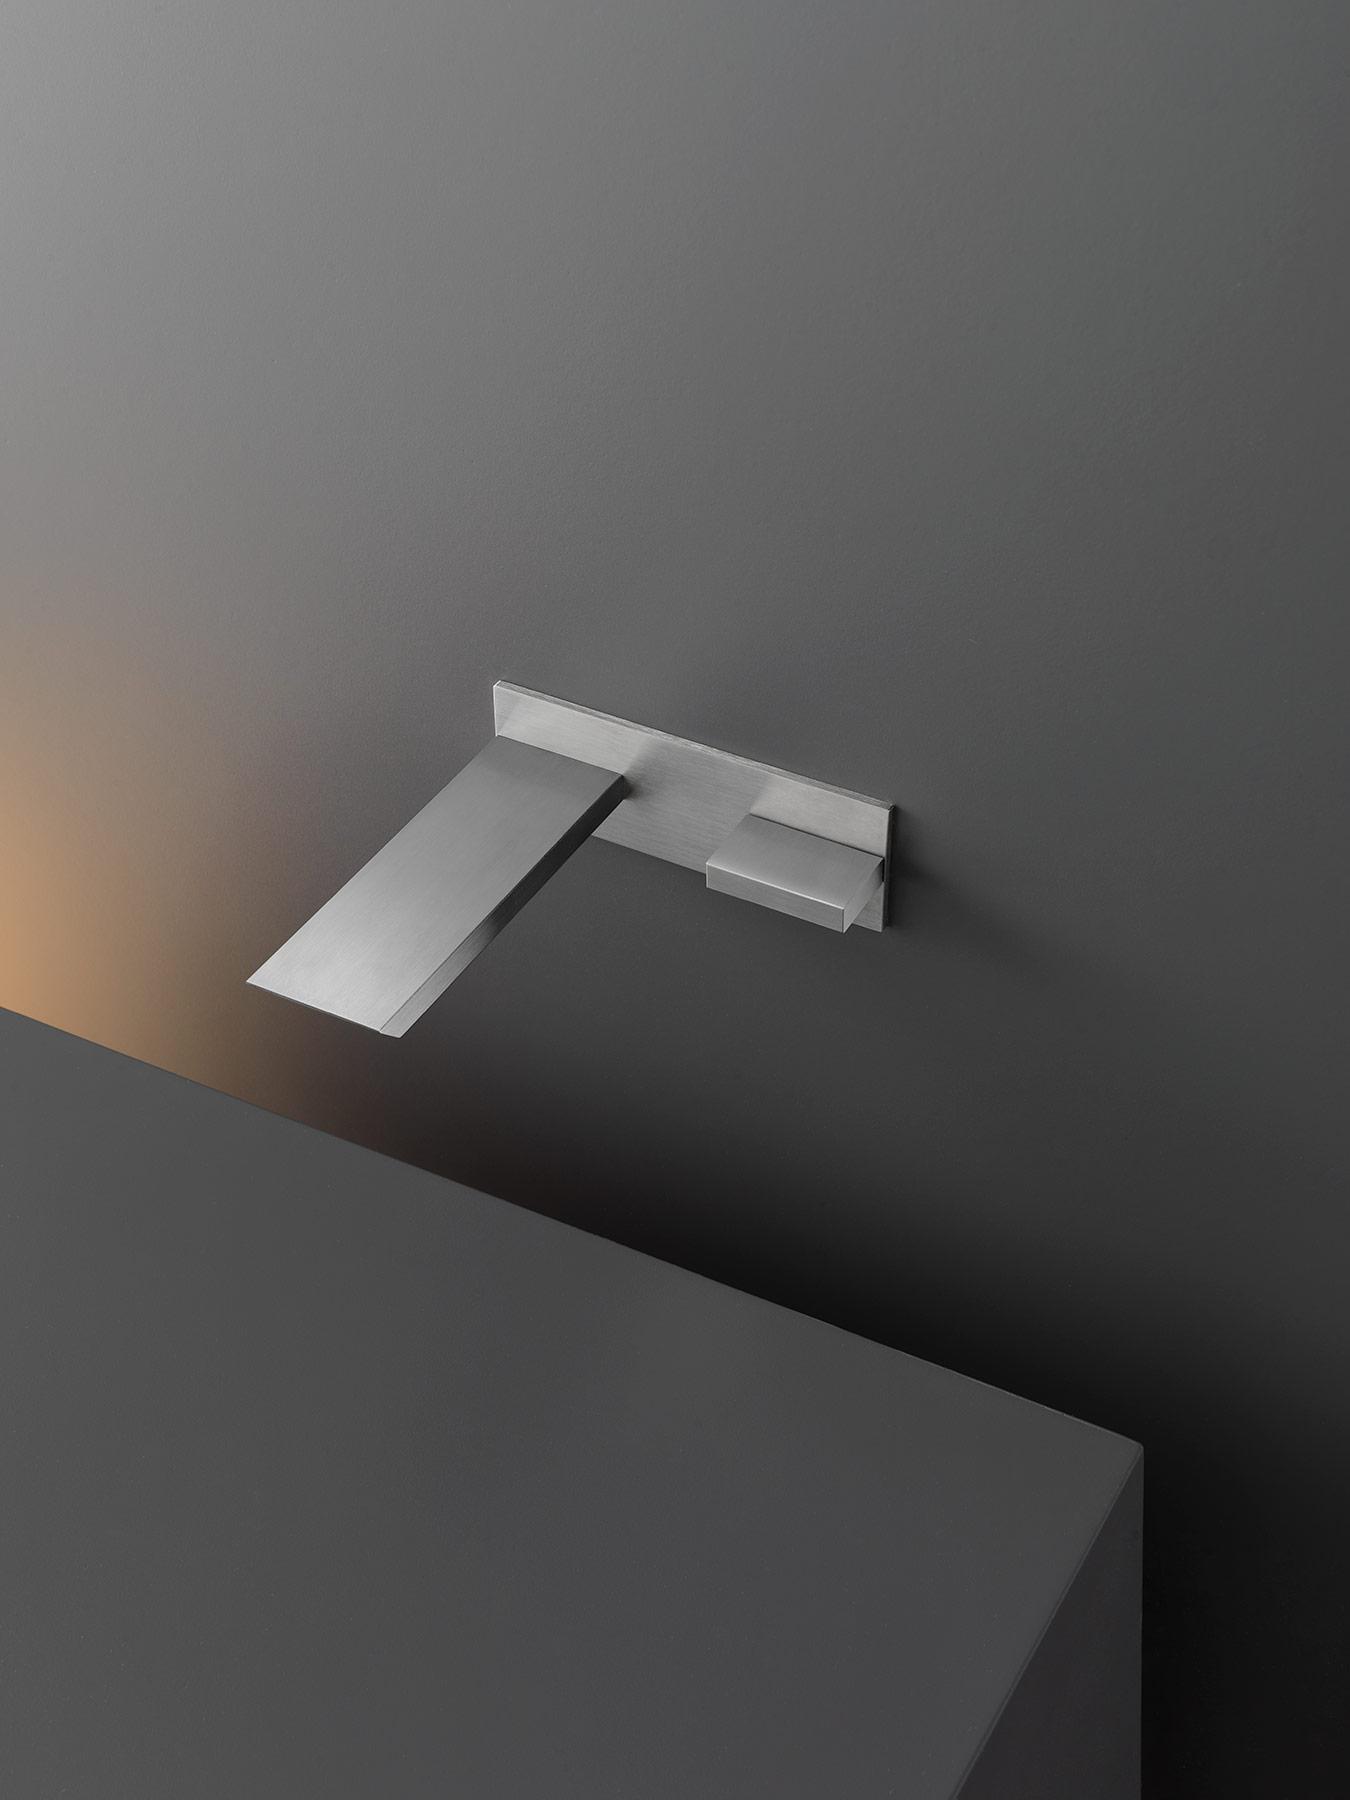 Contemporary Bar Wall Mount Faucet